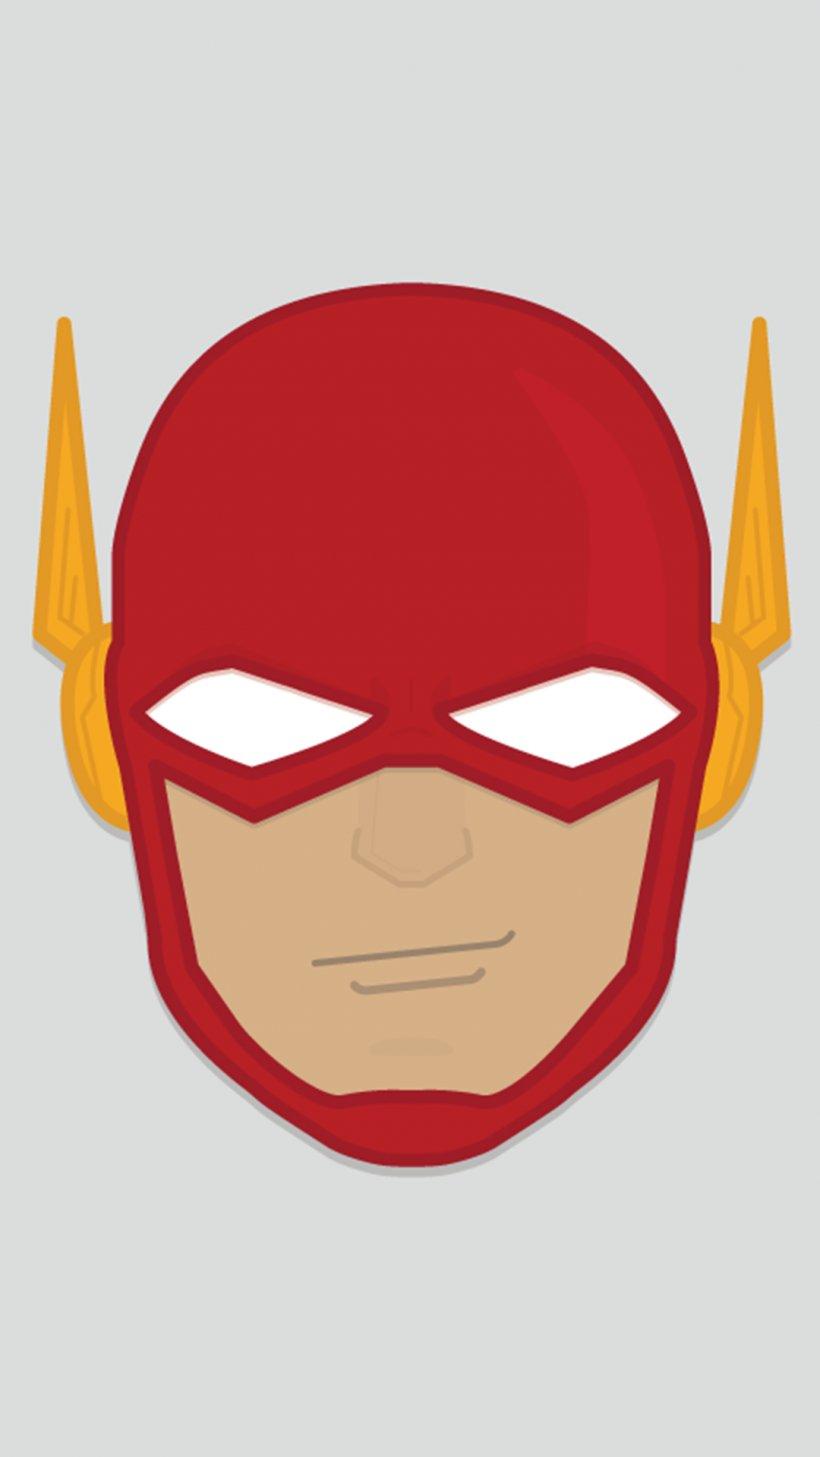 The Flash Desktop Wallpaper Superhero Png 1080x1920px Flash Art Cartoon Cheek Comic Book Download Free